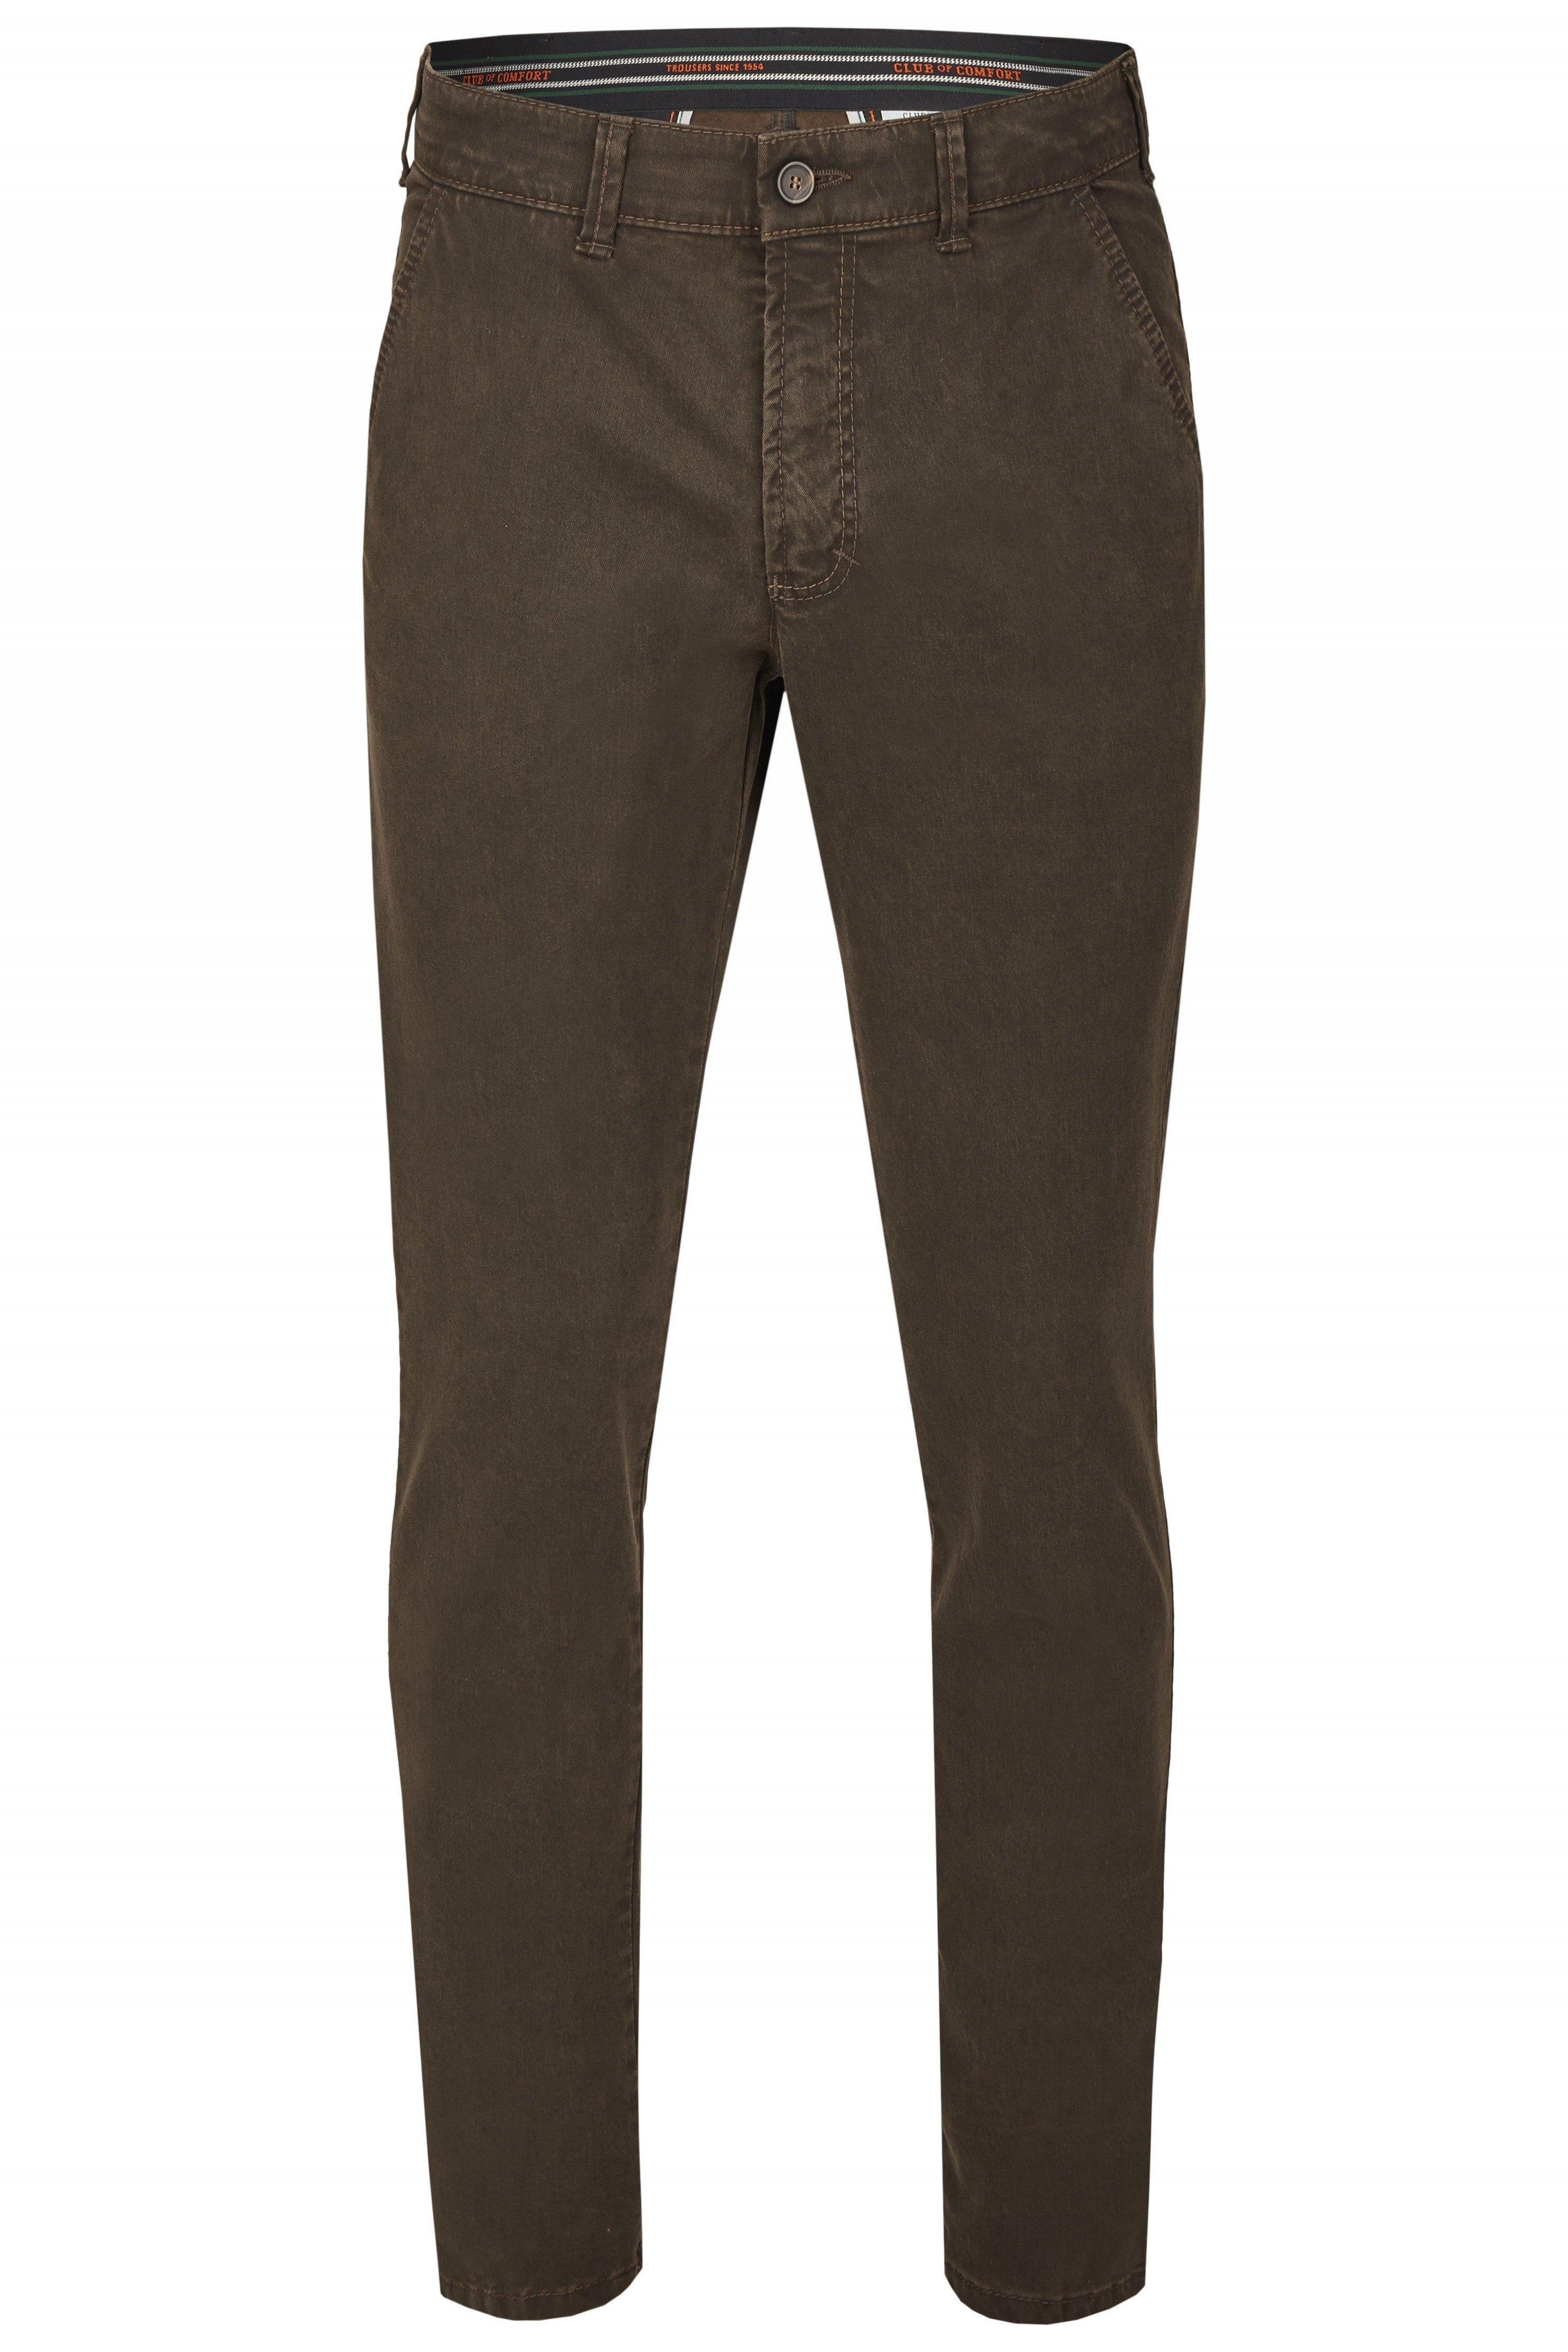 Club of Comfort Slim fit jeans